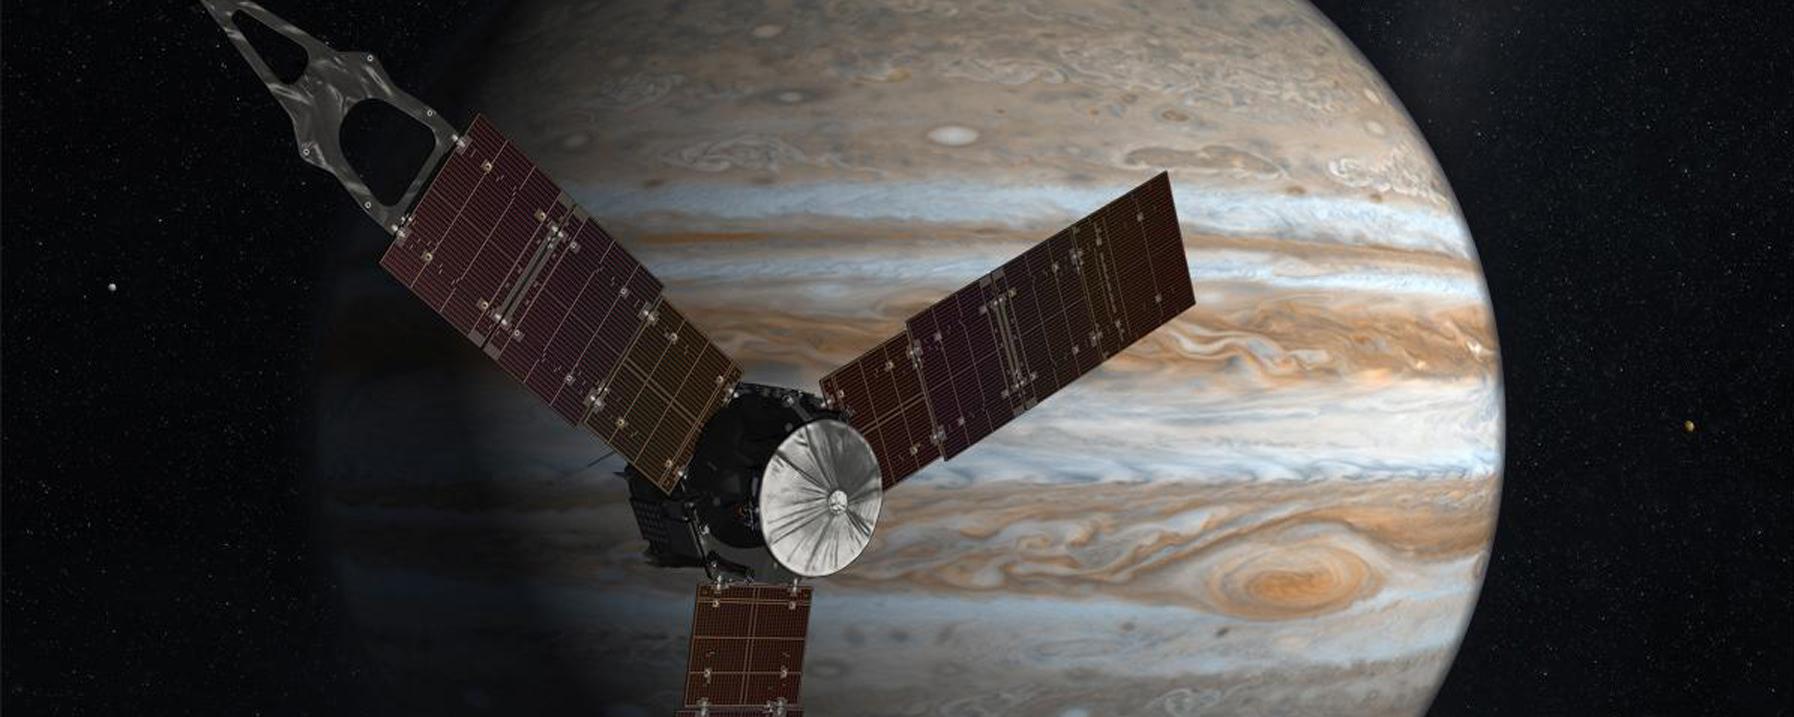 An artist's vision of the Juno spacecraft orbiting Jupiter. Credit: Nasa